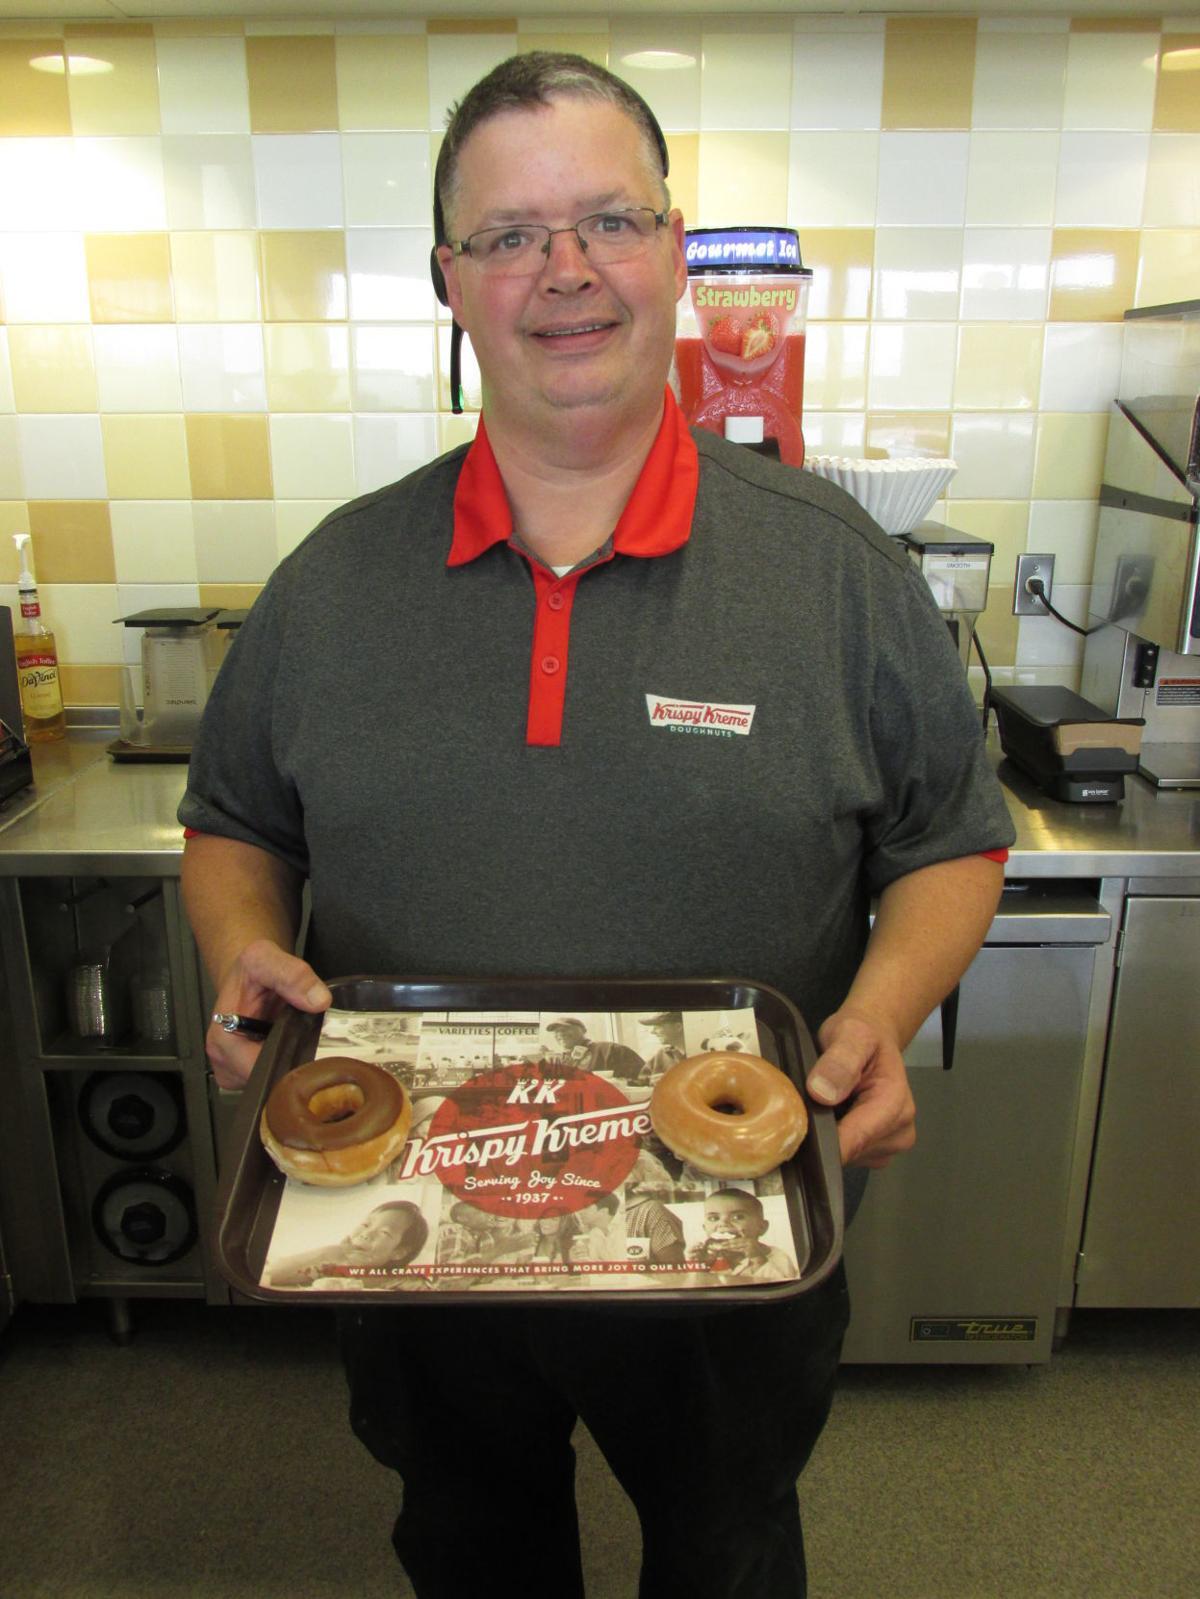 Krispy Kreme Donuts Manager John Hoskinson